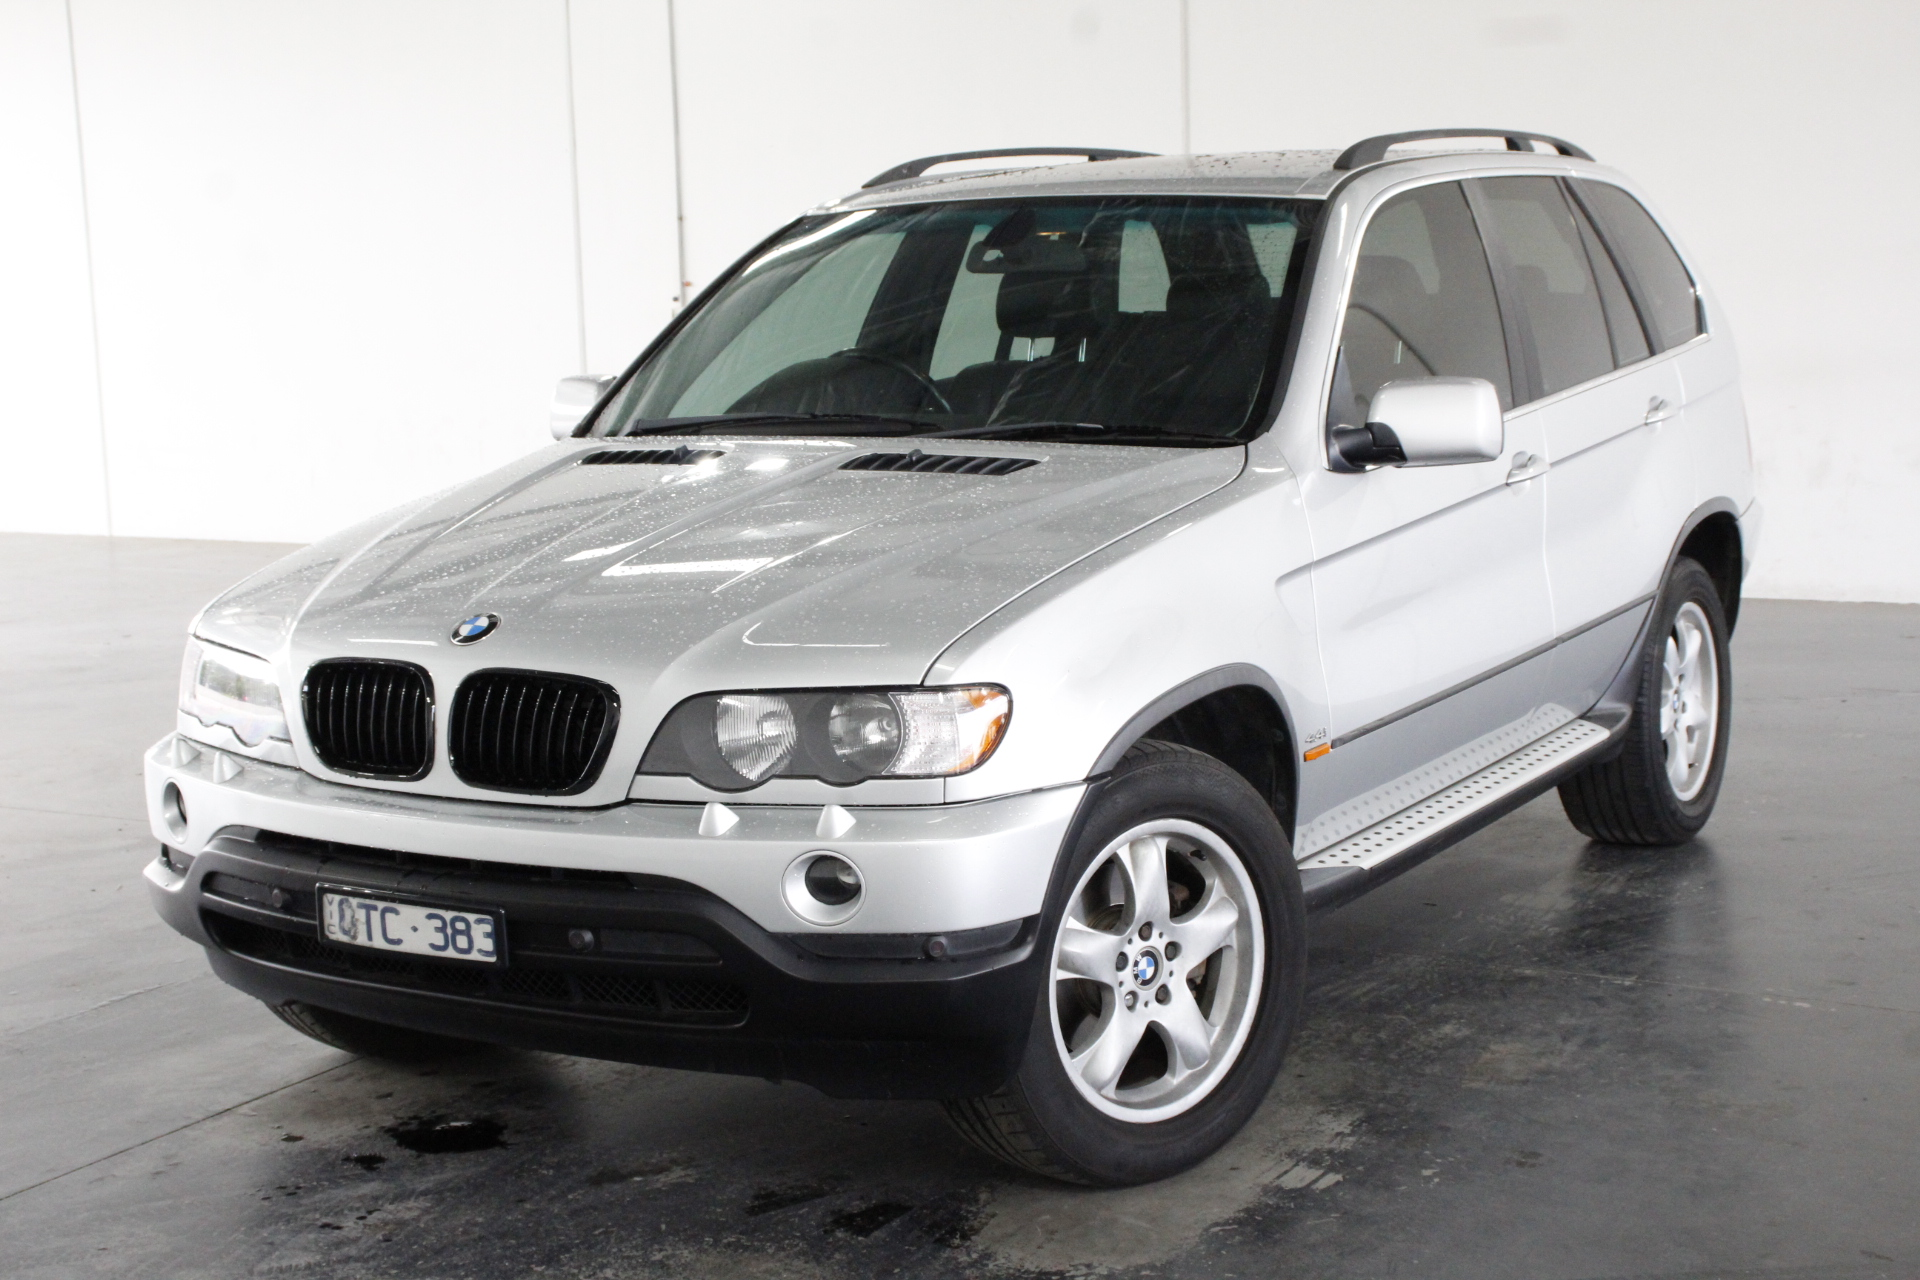 2001 BMW X5 4.4i E53 Automatic Wagon